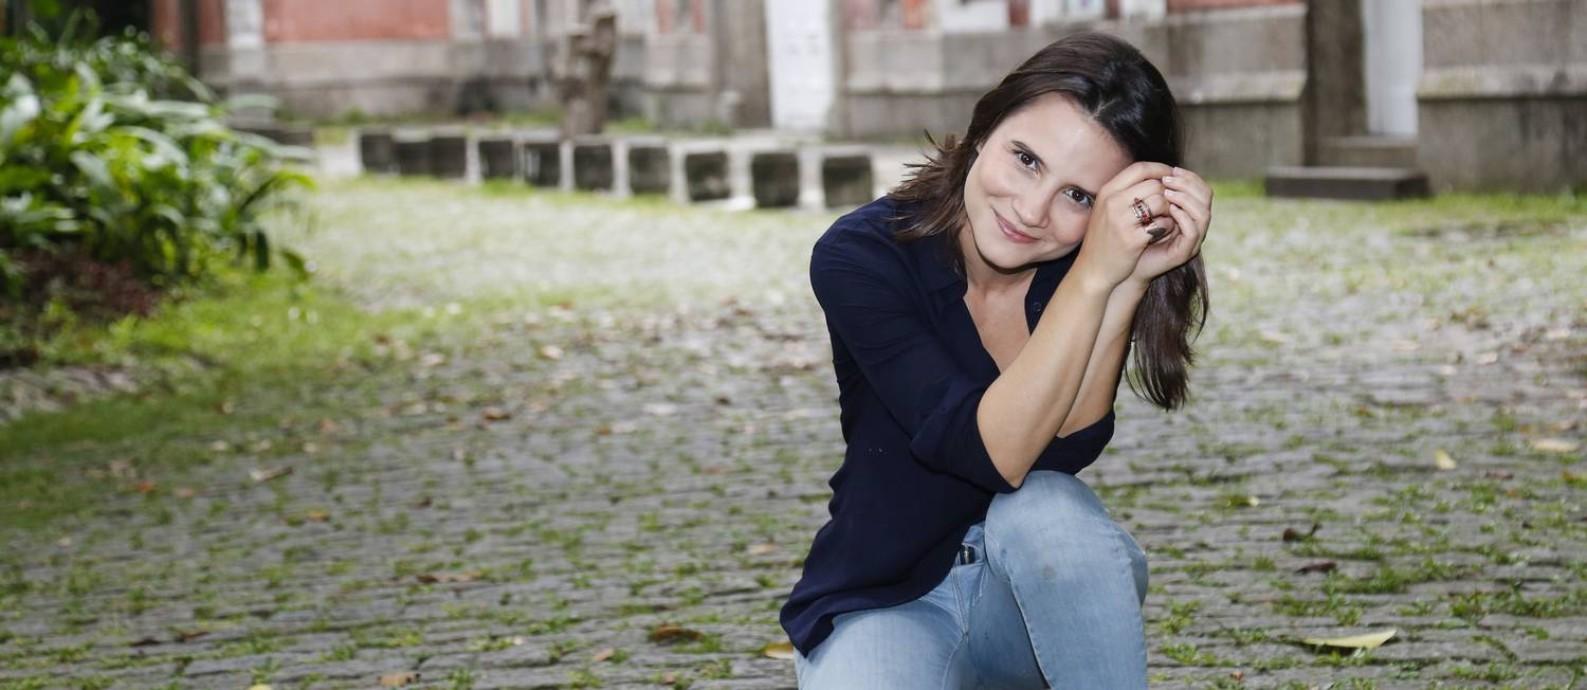 A atriz Bianca Comparato, de '3%' Foto: Marcos Ramos / O Globo